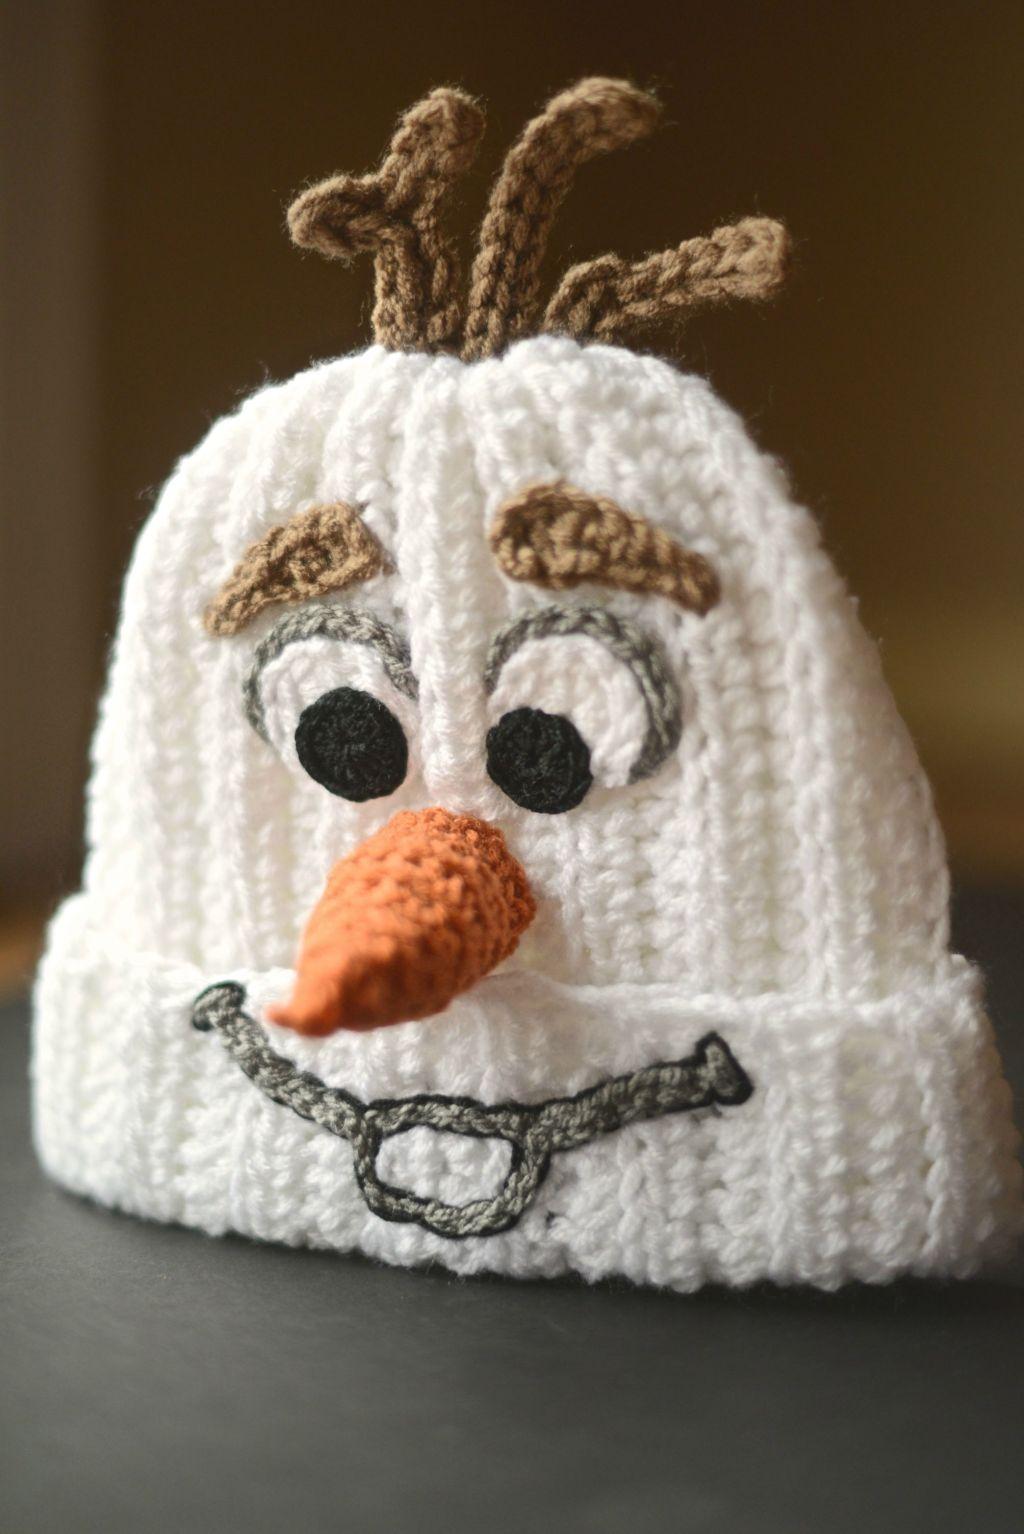 Crochet Pattern For Olaf : Homemade Crocheted Olaf Hat Make: